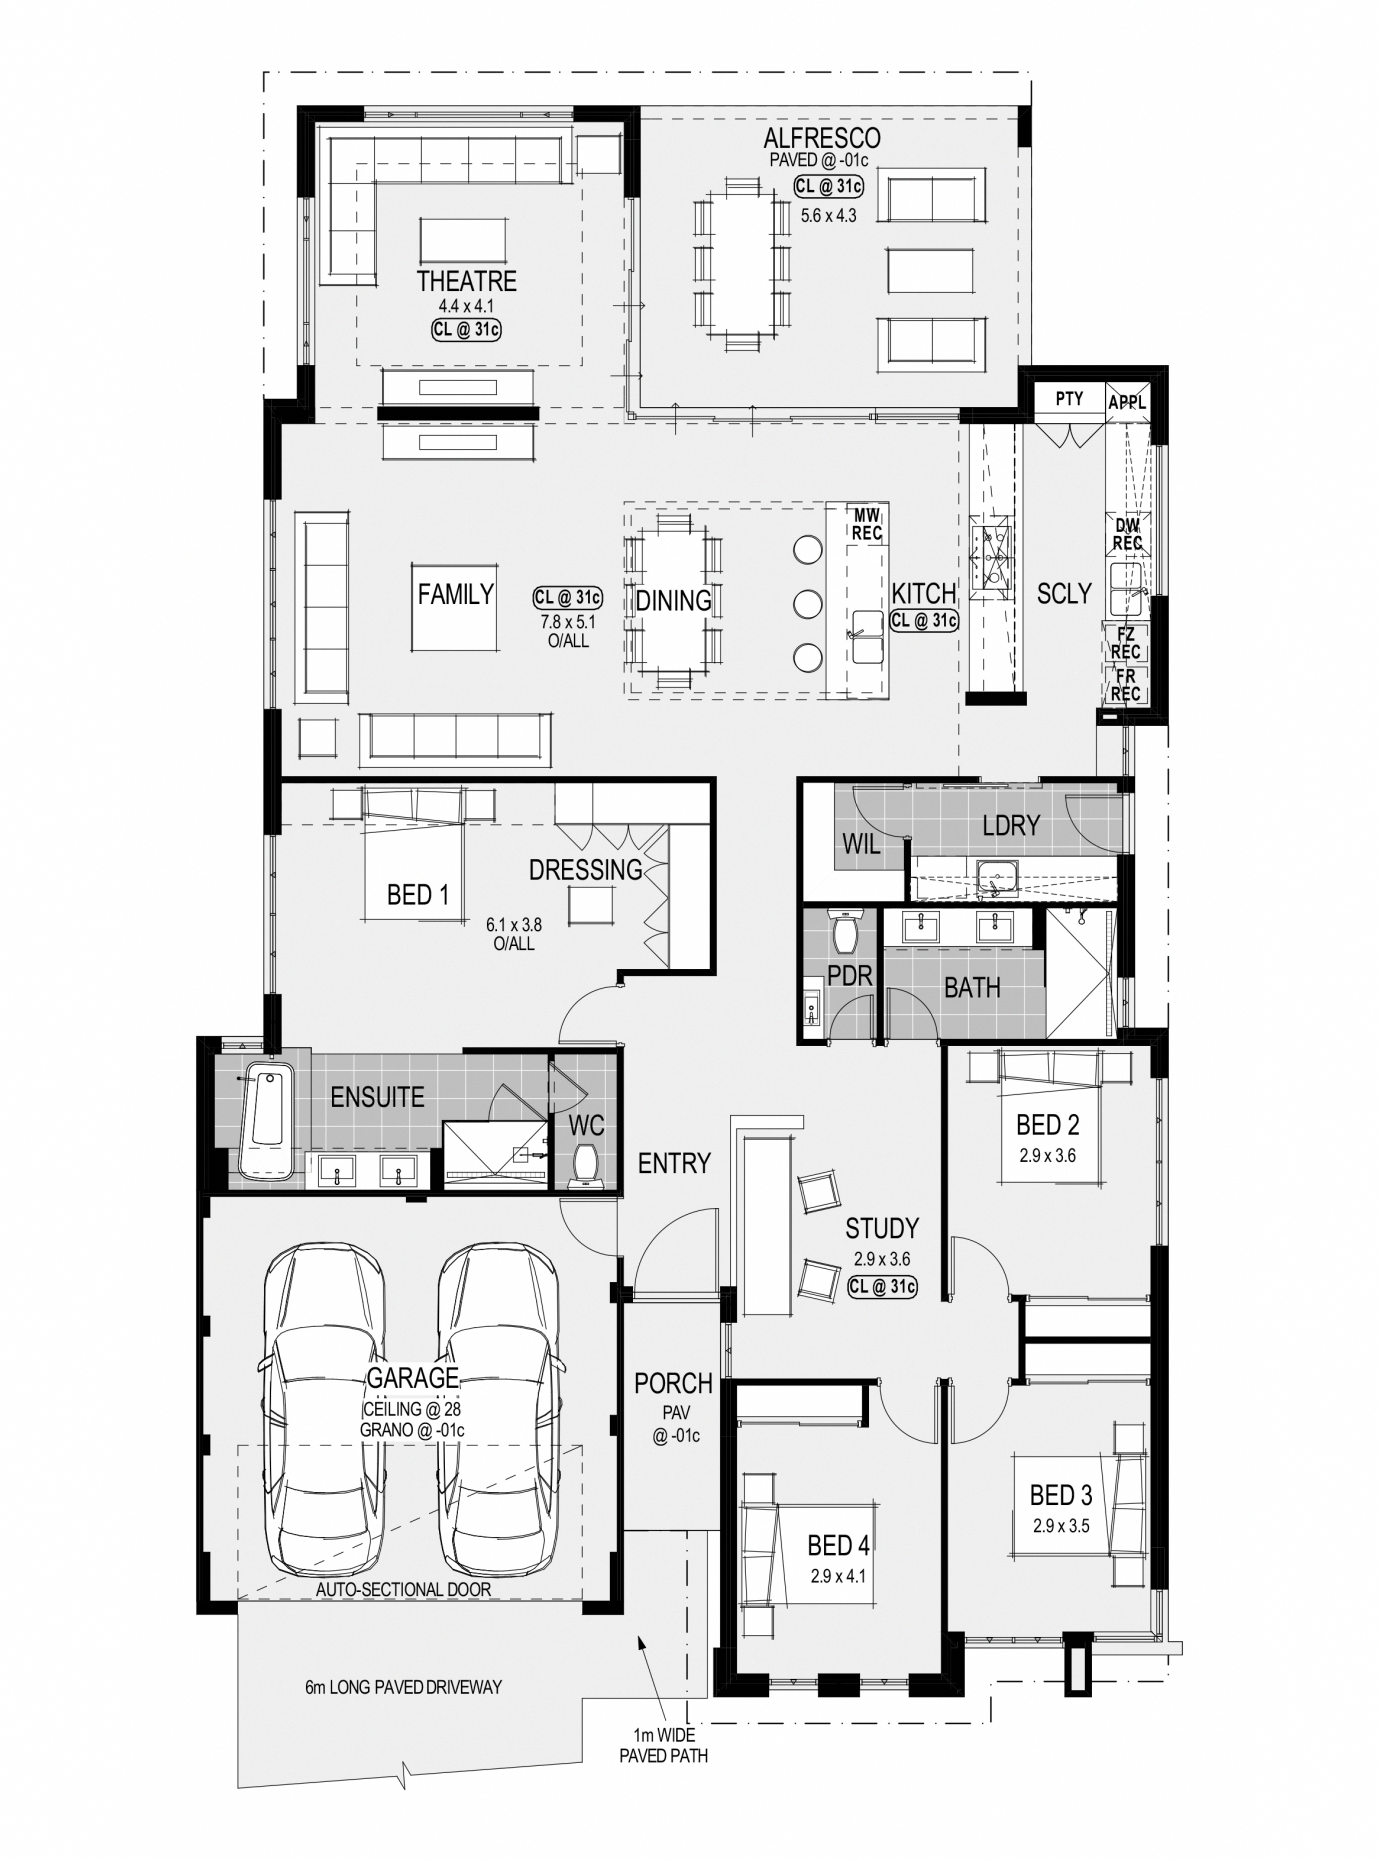 Bedroom Interior Planning Advice Simpleinteriorbedroomdesign House Plans Australia Home Design Floor Plans House Plans